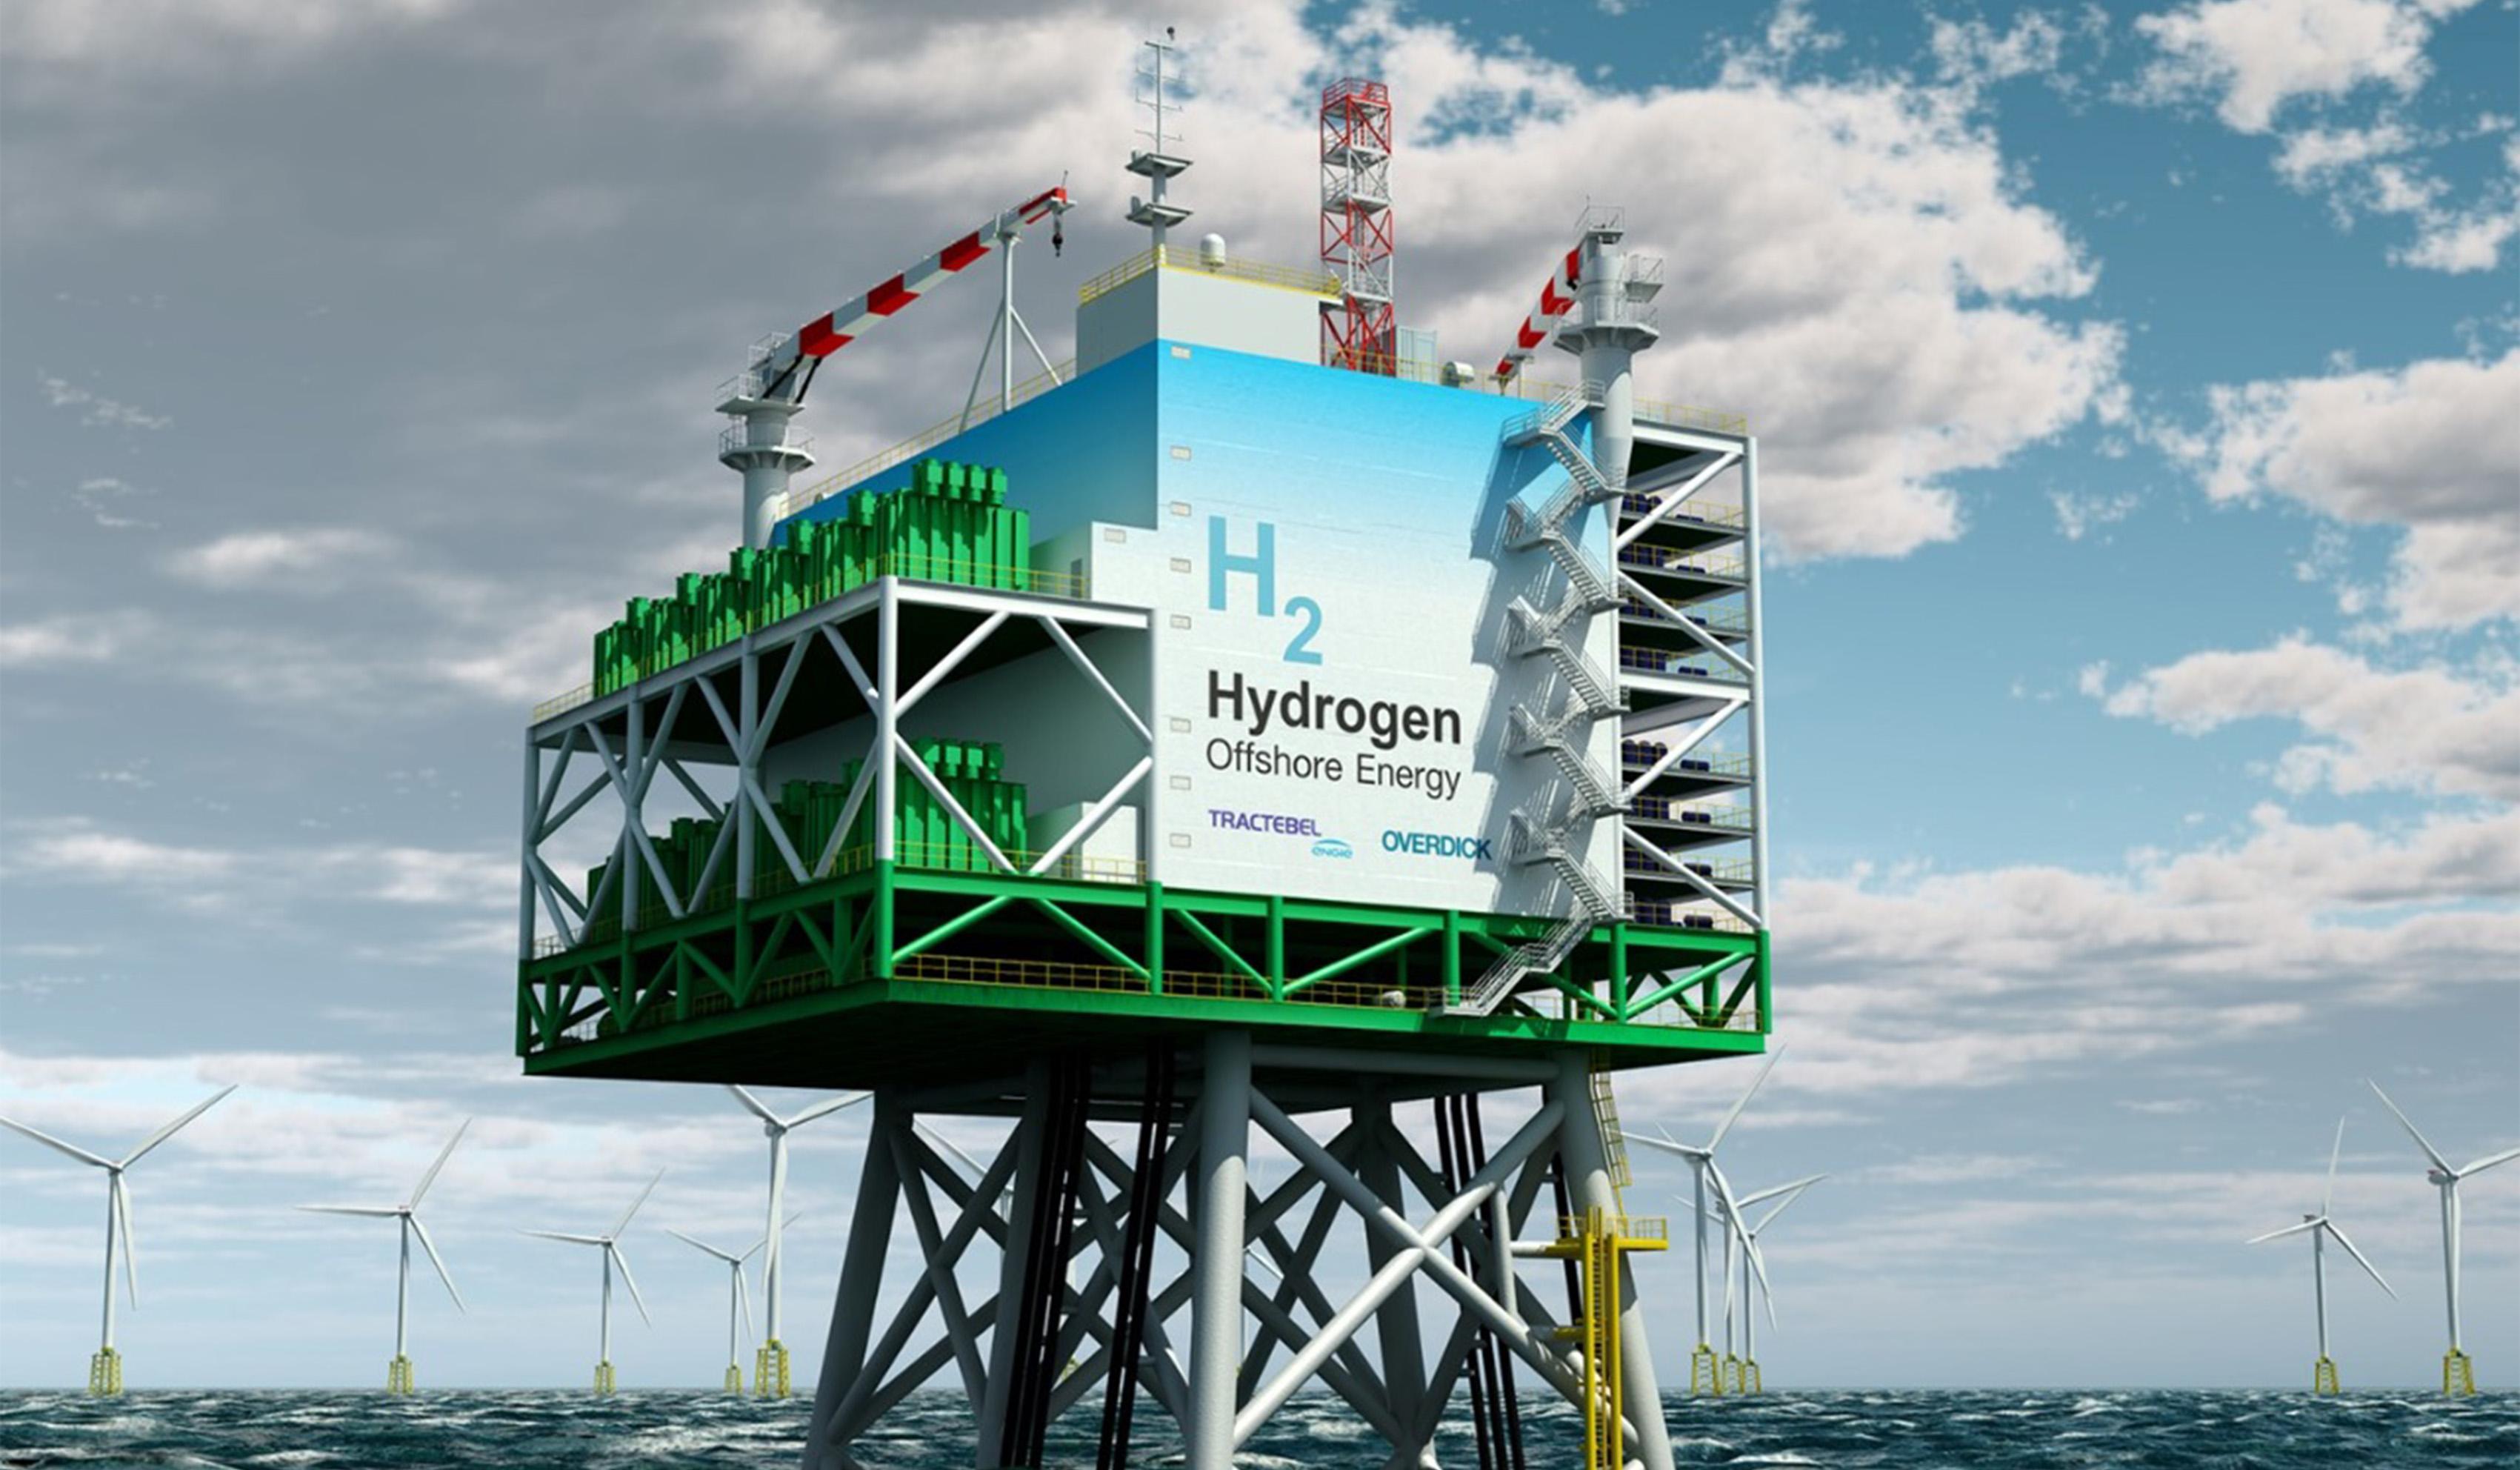 400 MW Offshore Hydrogen Production Platform